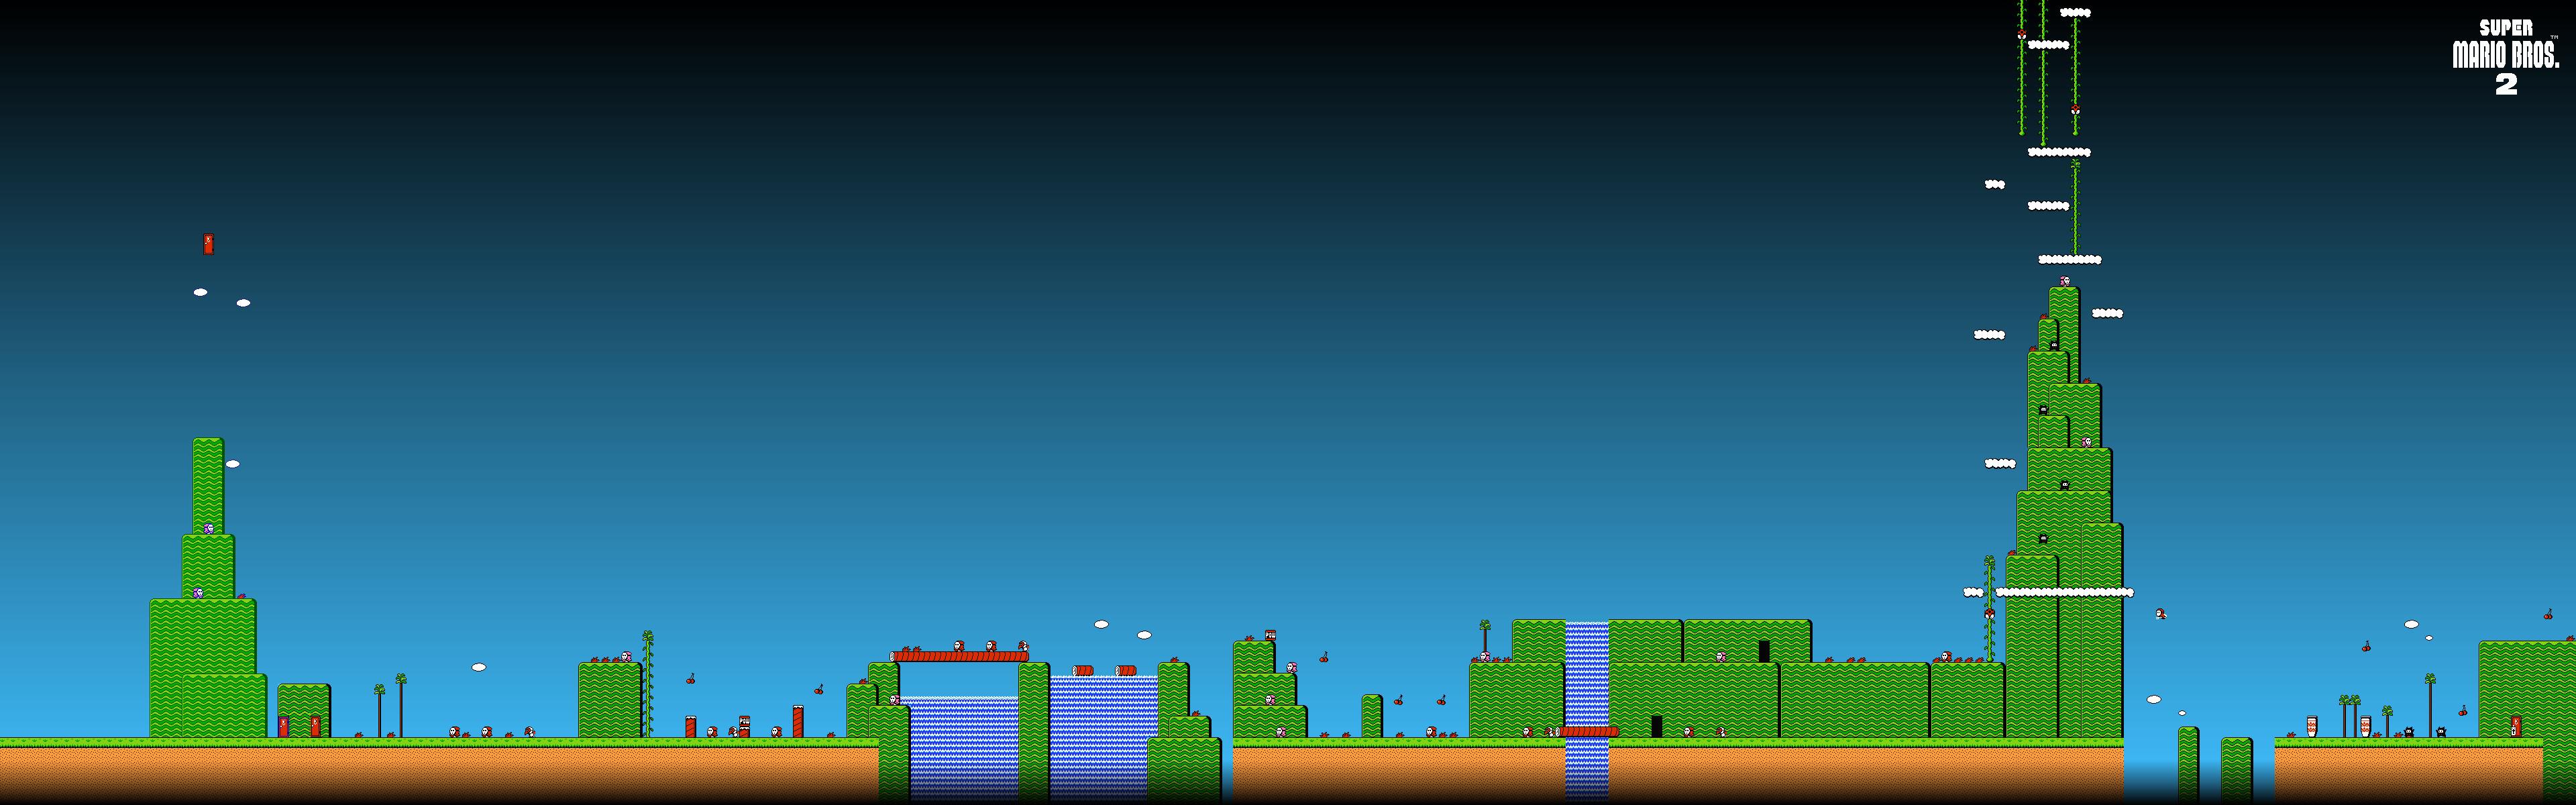 Multi Monitor – Video Game Wallpaper